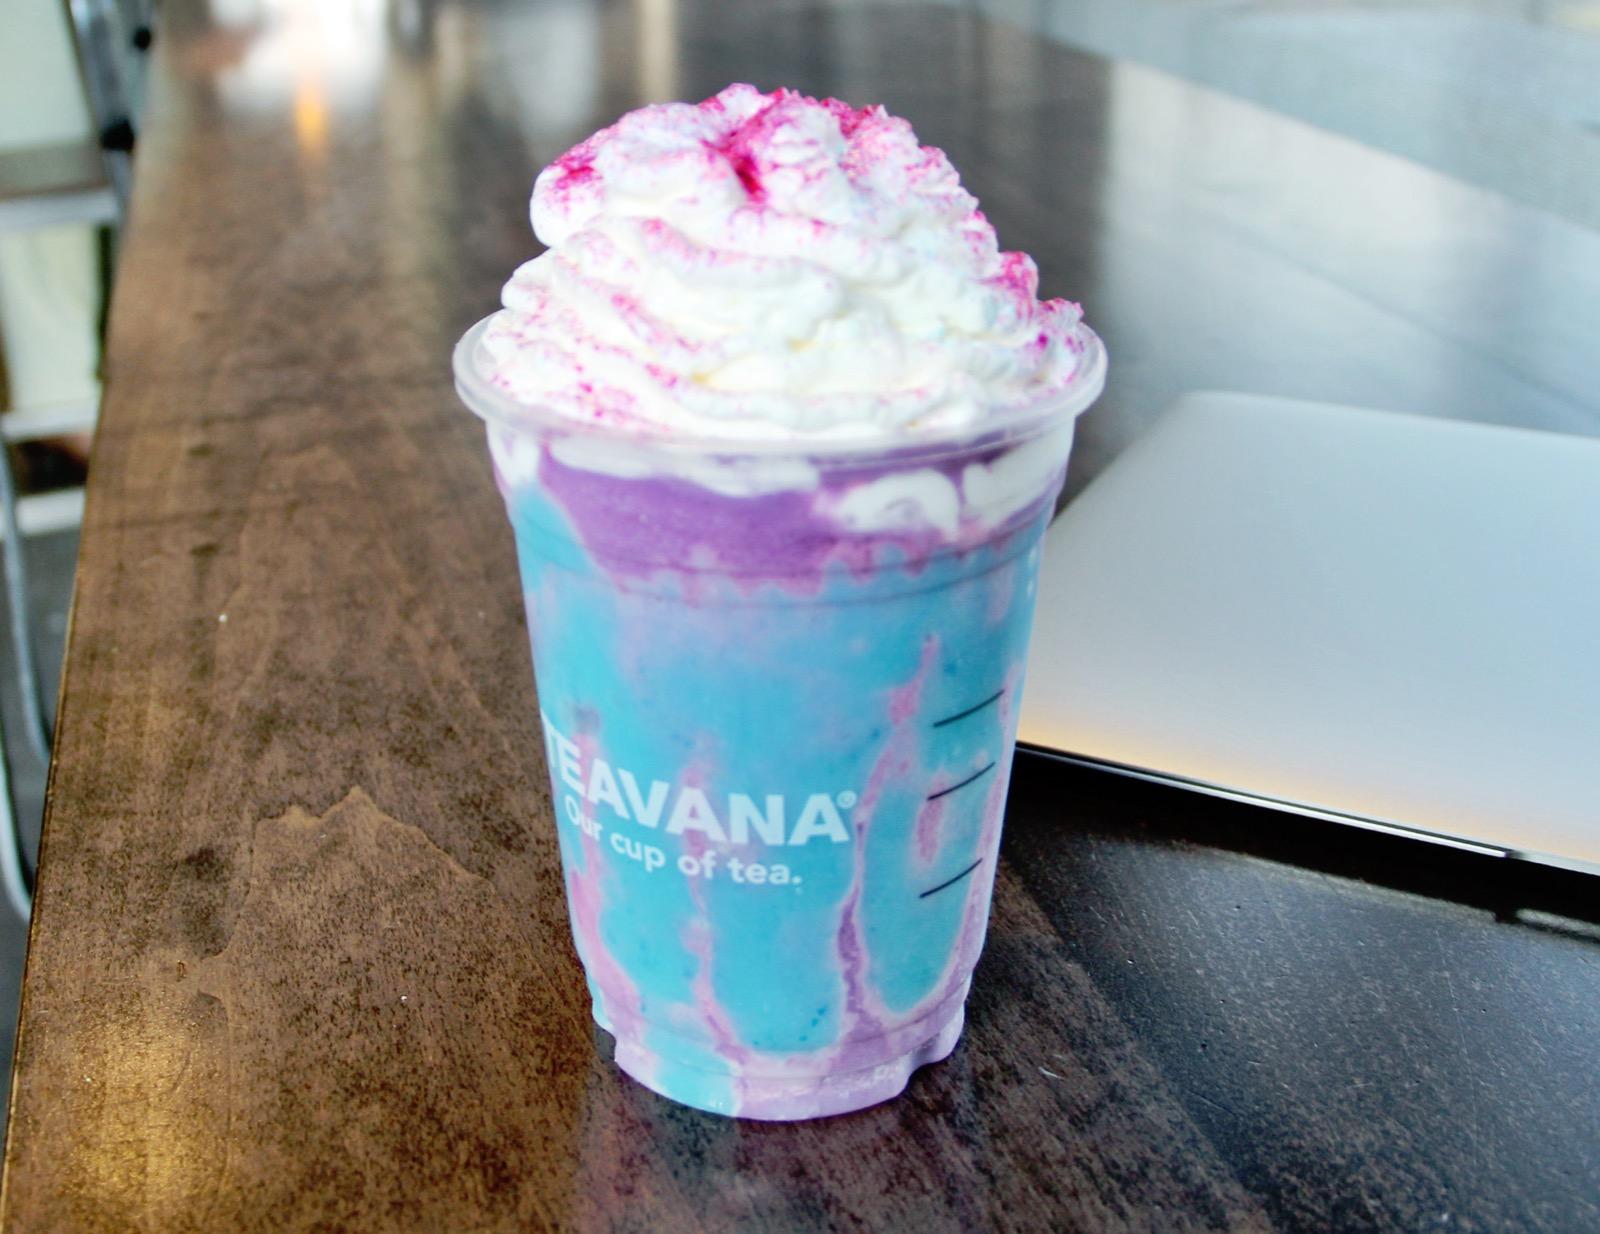 Starbucks' Unicorn Frappuccino on its release date.